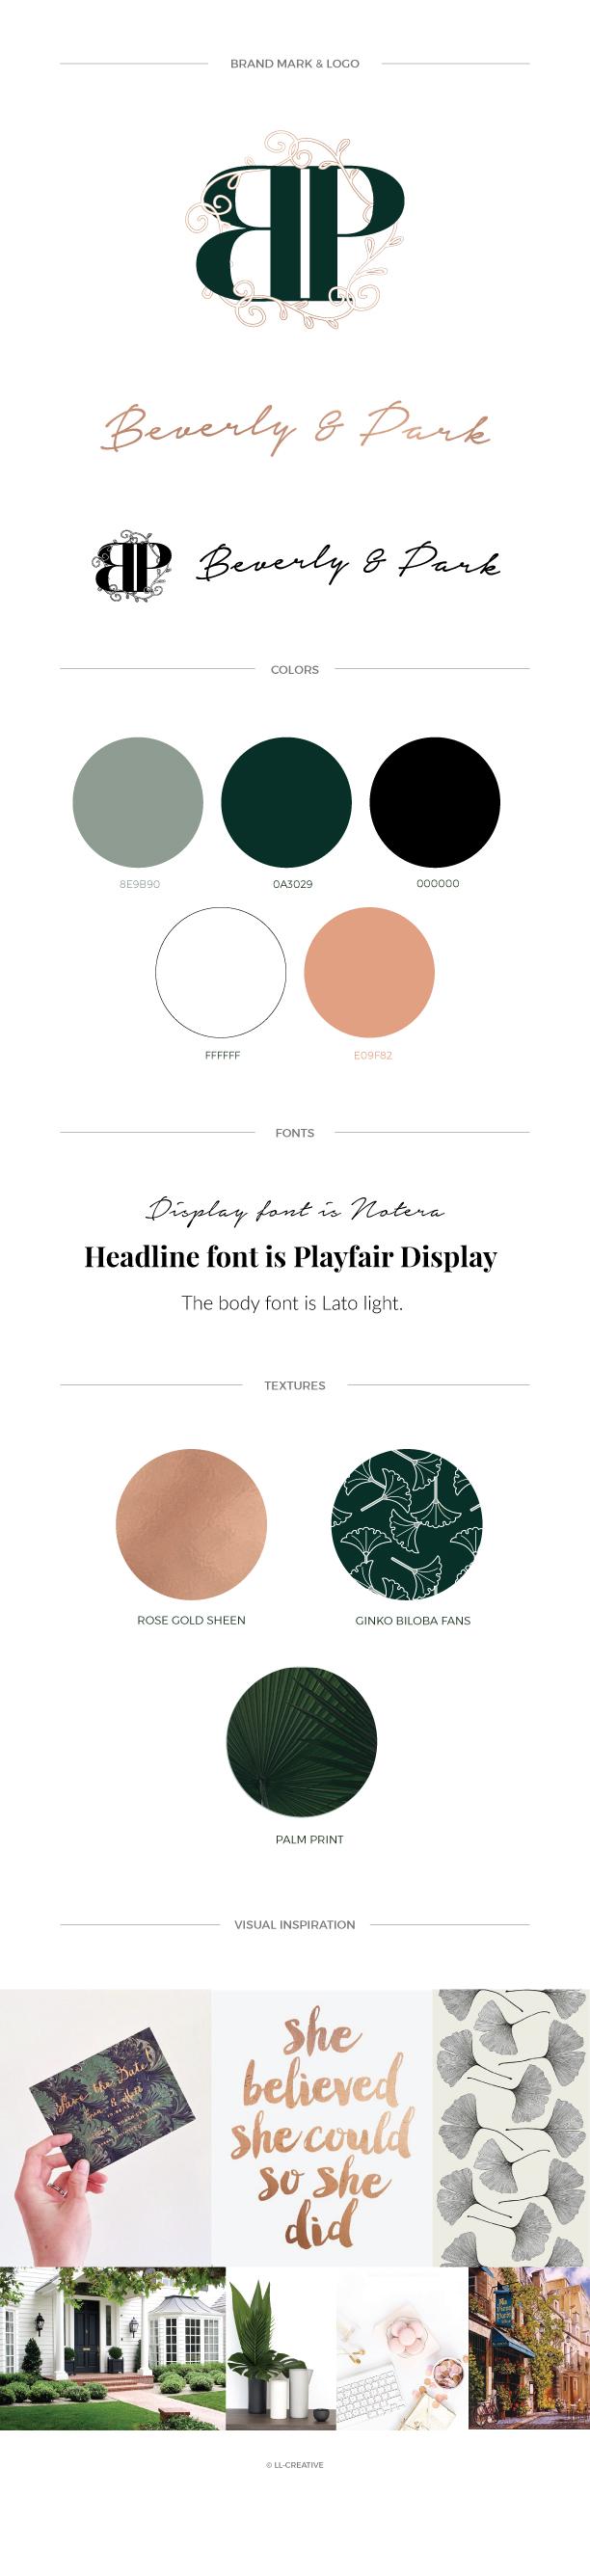 Brand Design: Beverly & Park